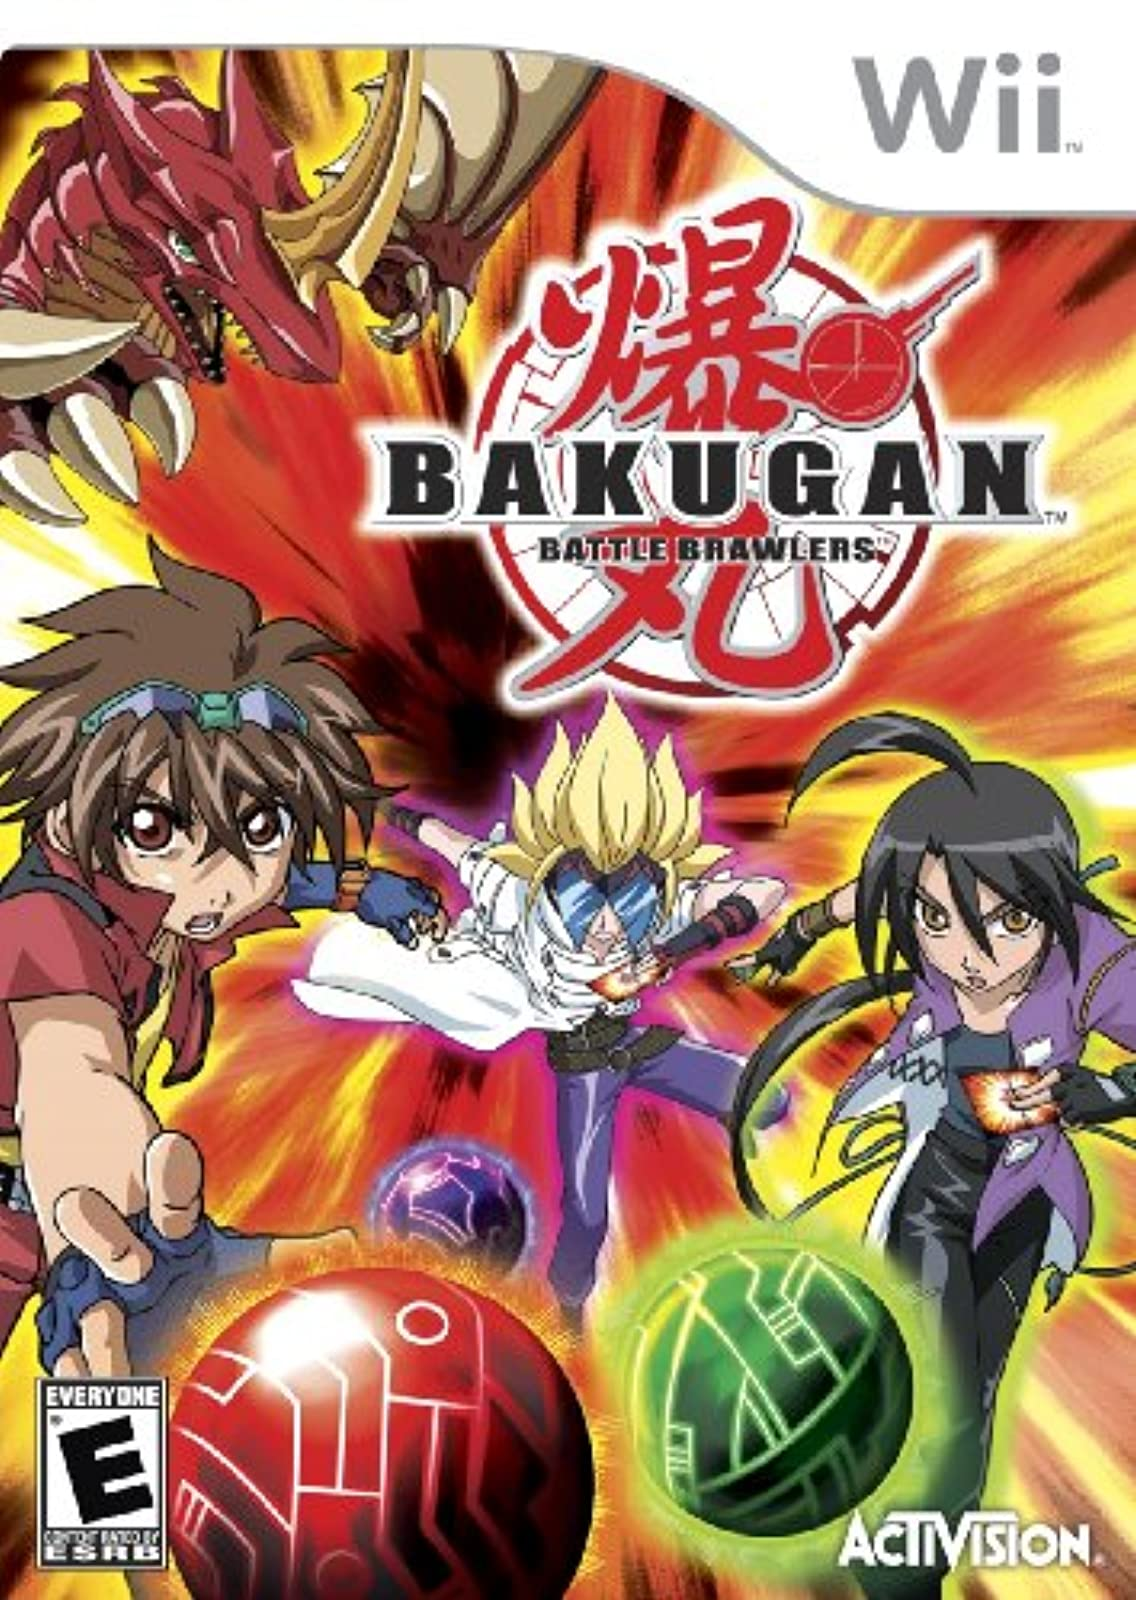 Bakugan Battle Brawlers For Wii And Wii U